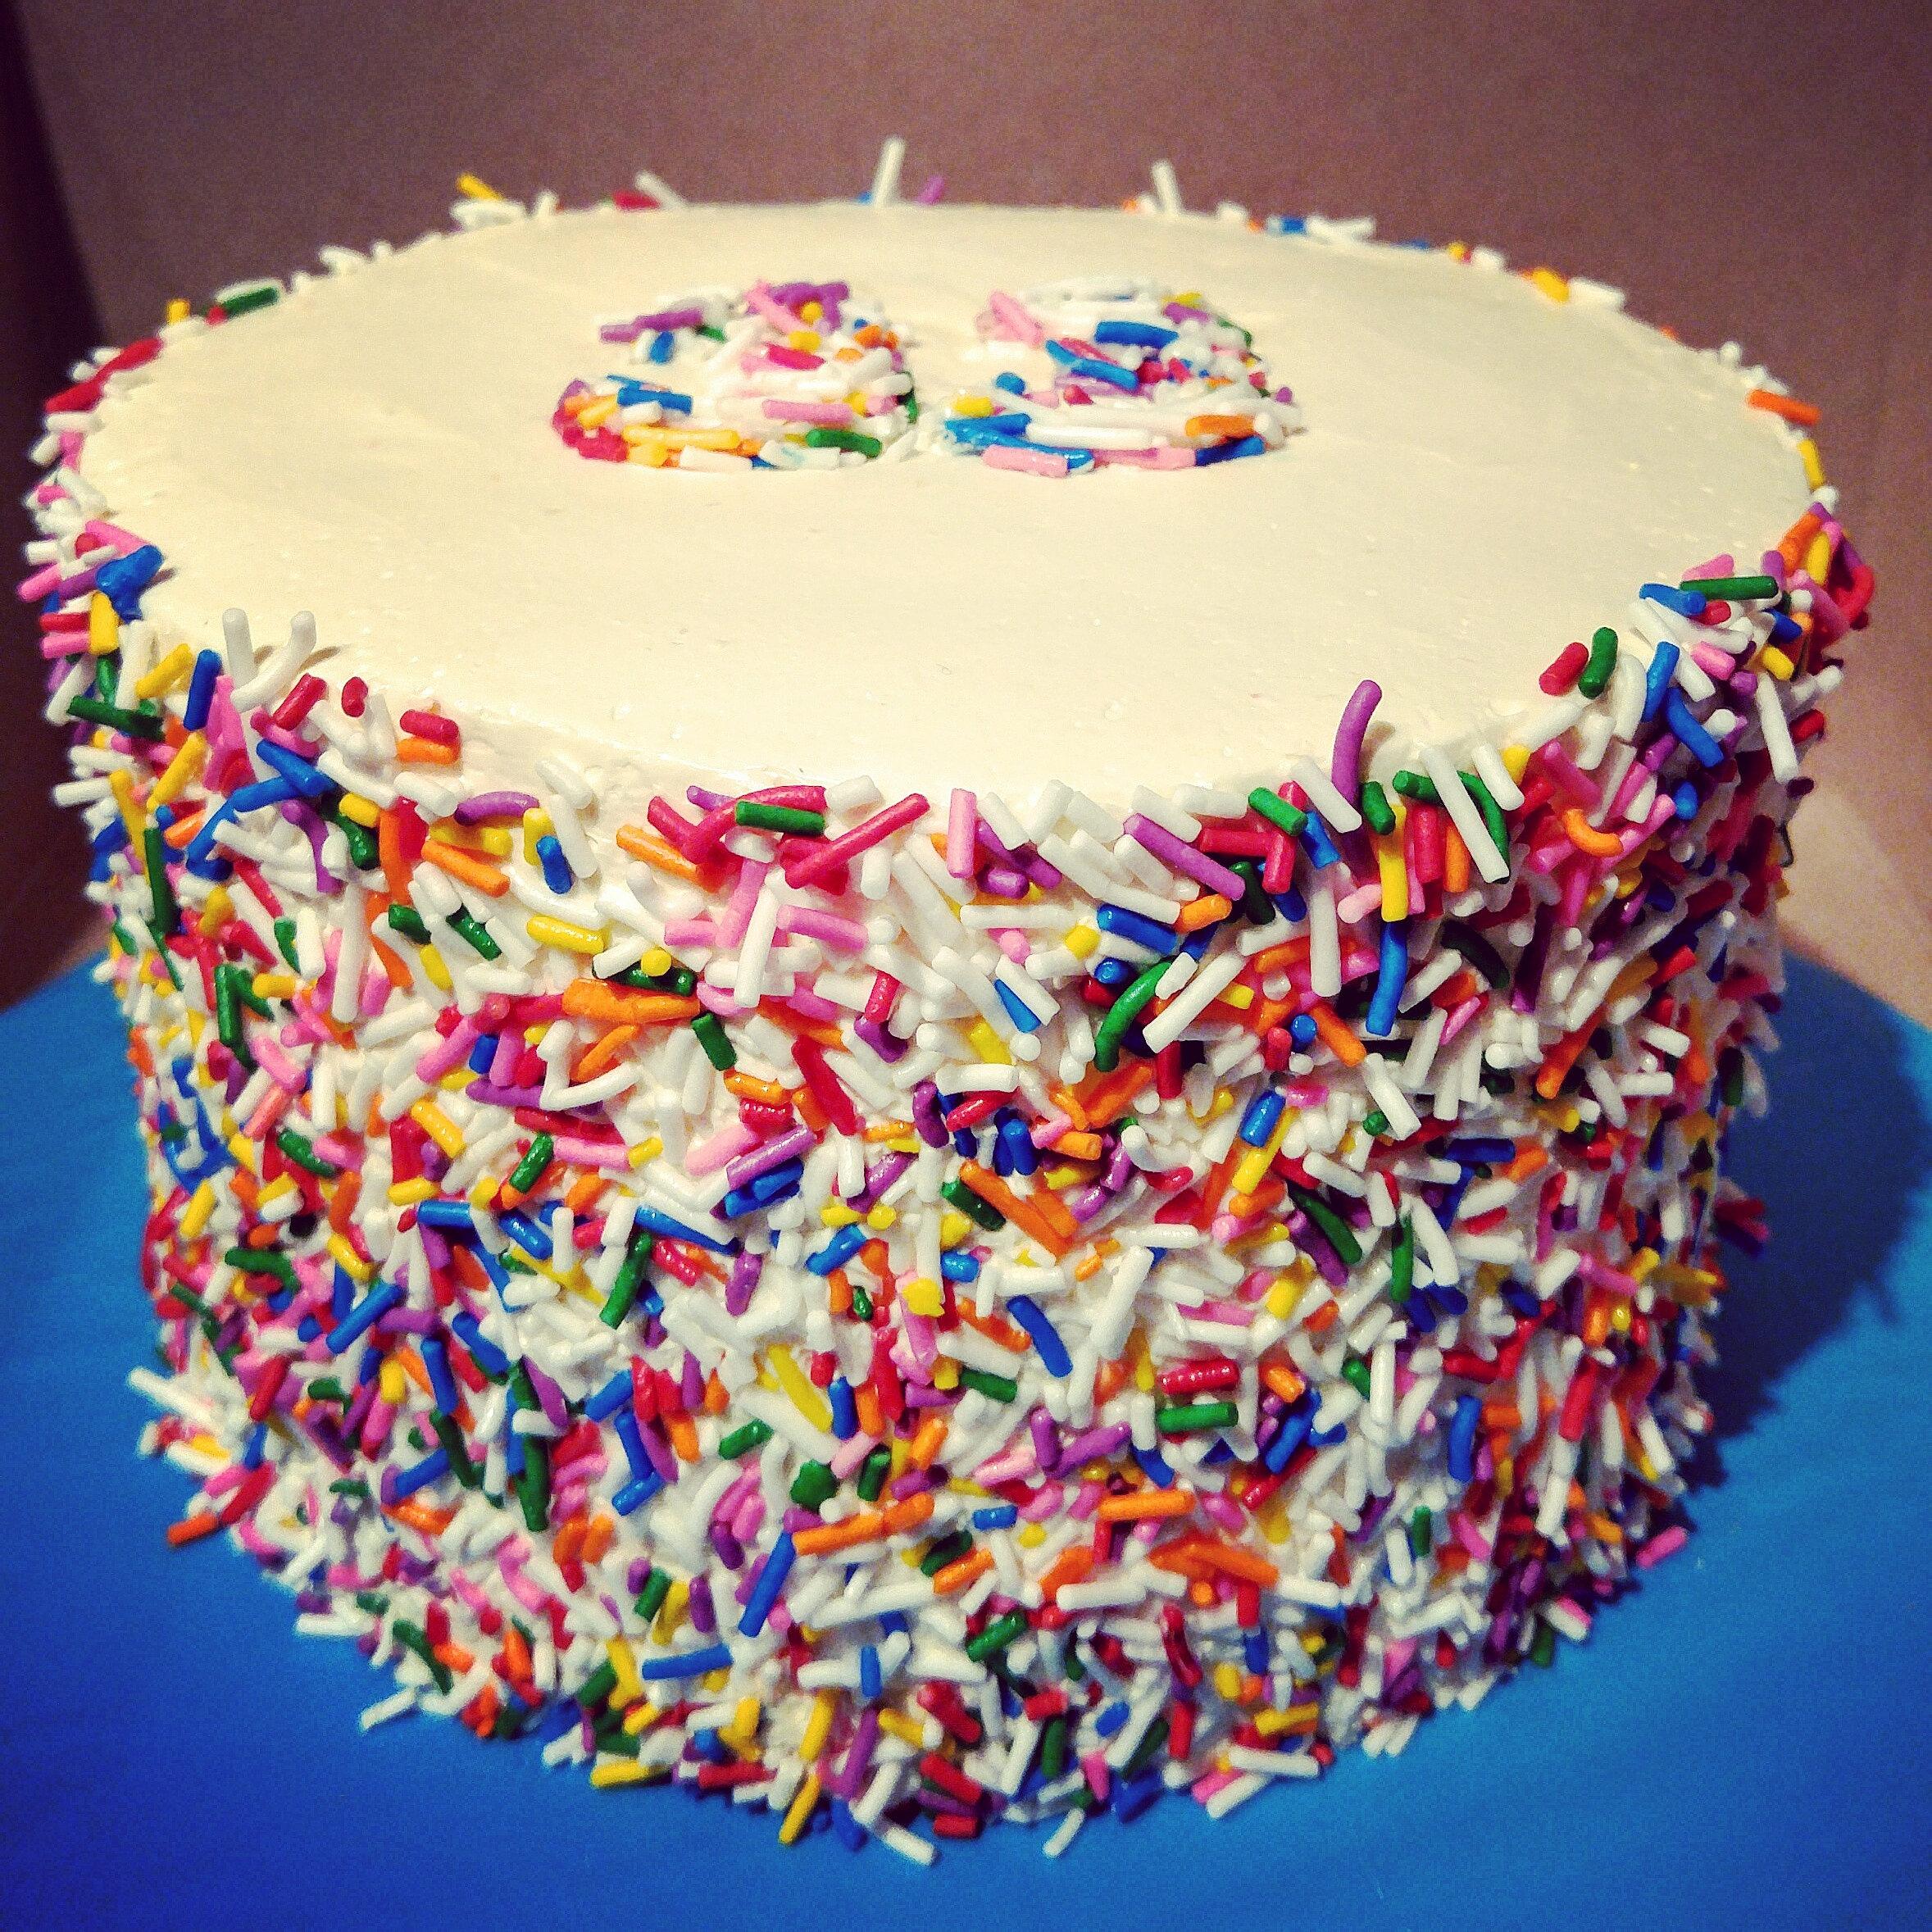 Magsdewdrops Creations StouffvilleMarkham Custom Cakes